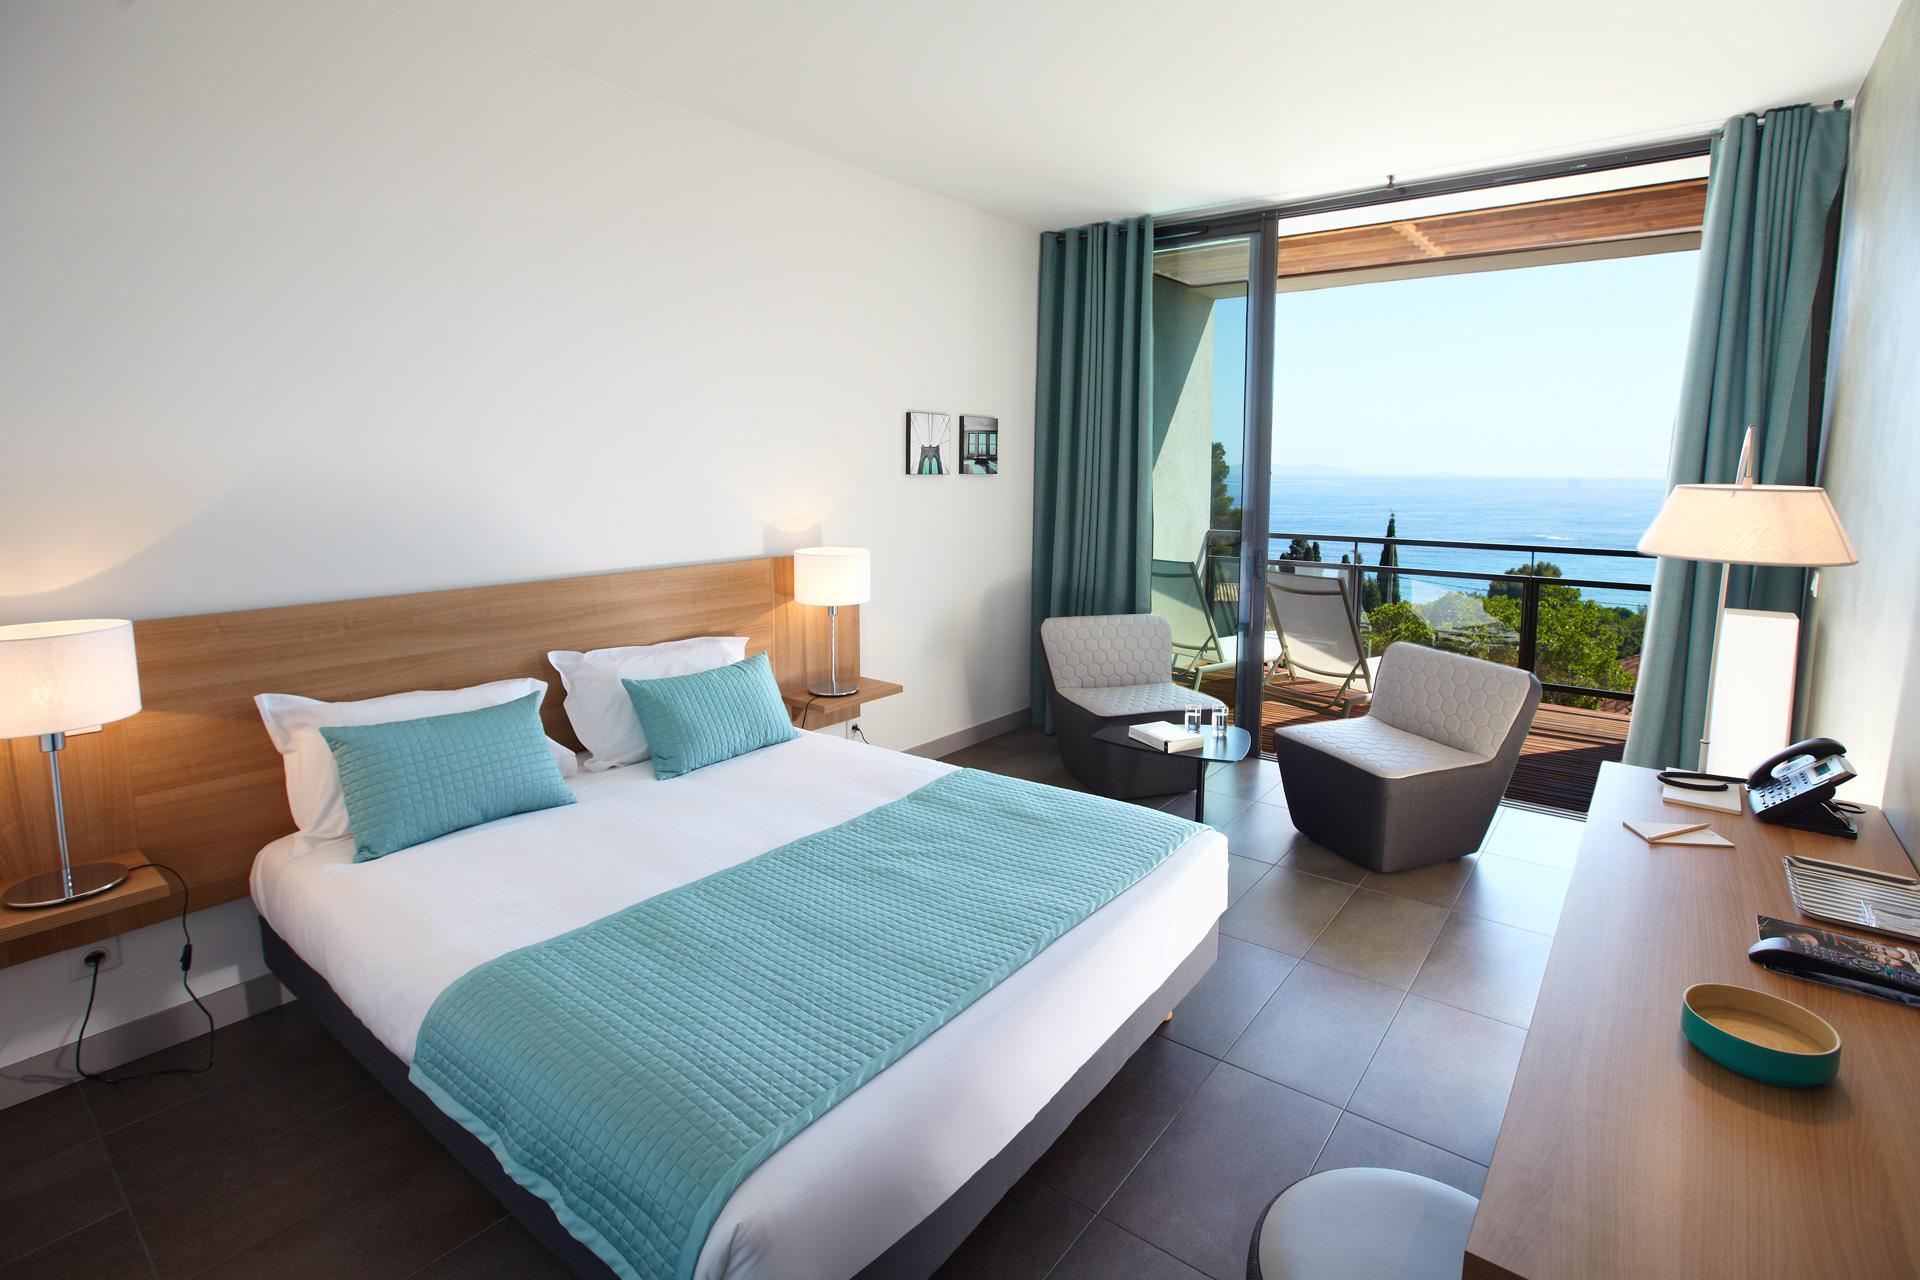 Superior Sea View Family Room with Balcony